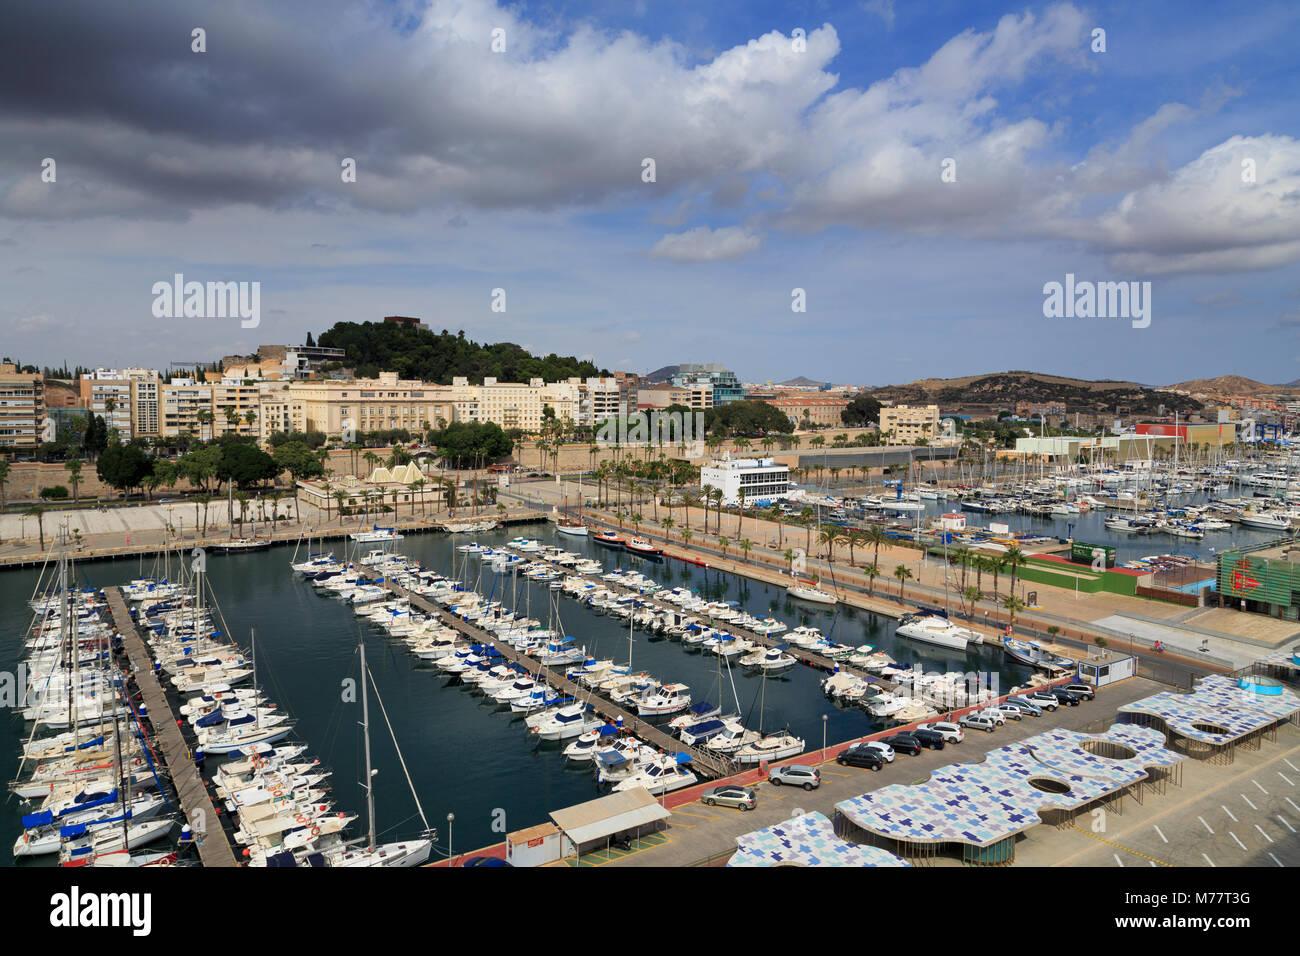 Yacht Marina, Cartagena, Murcia, Spagna, Europa Immagini Stock